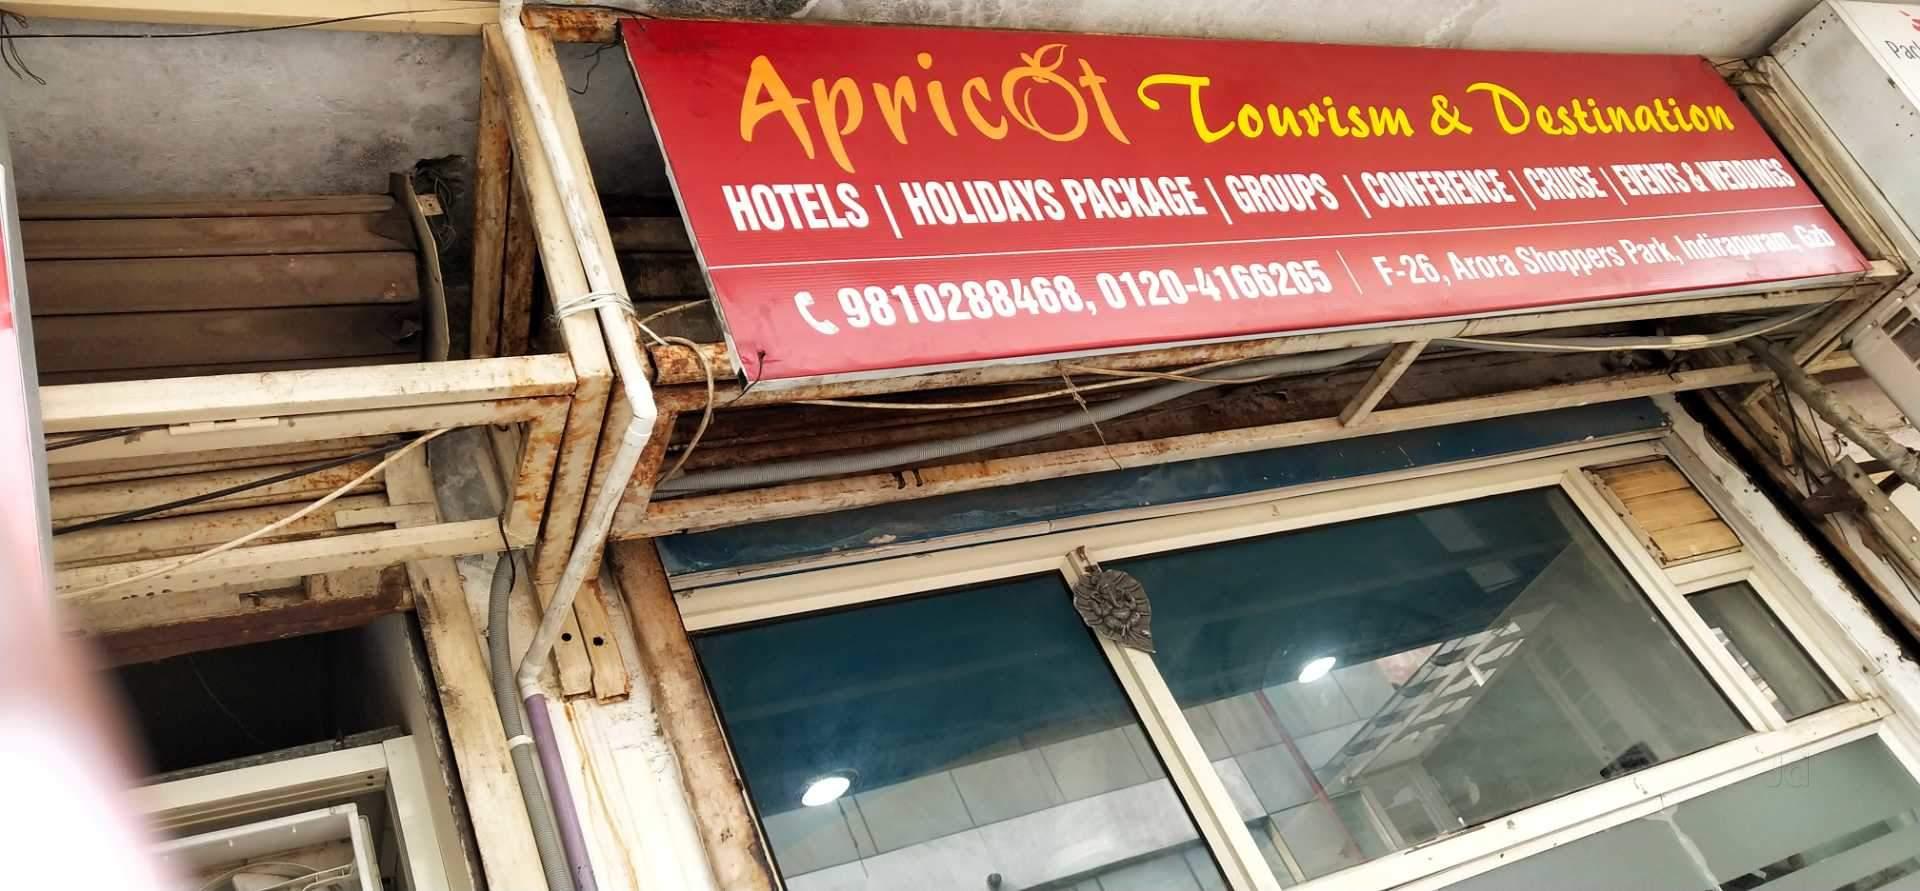 Apricot Tourism